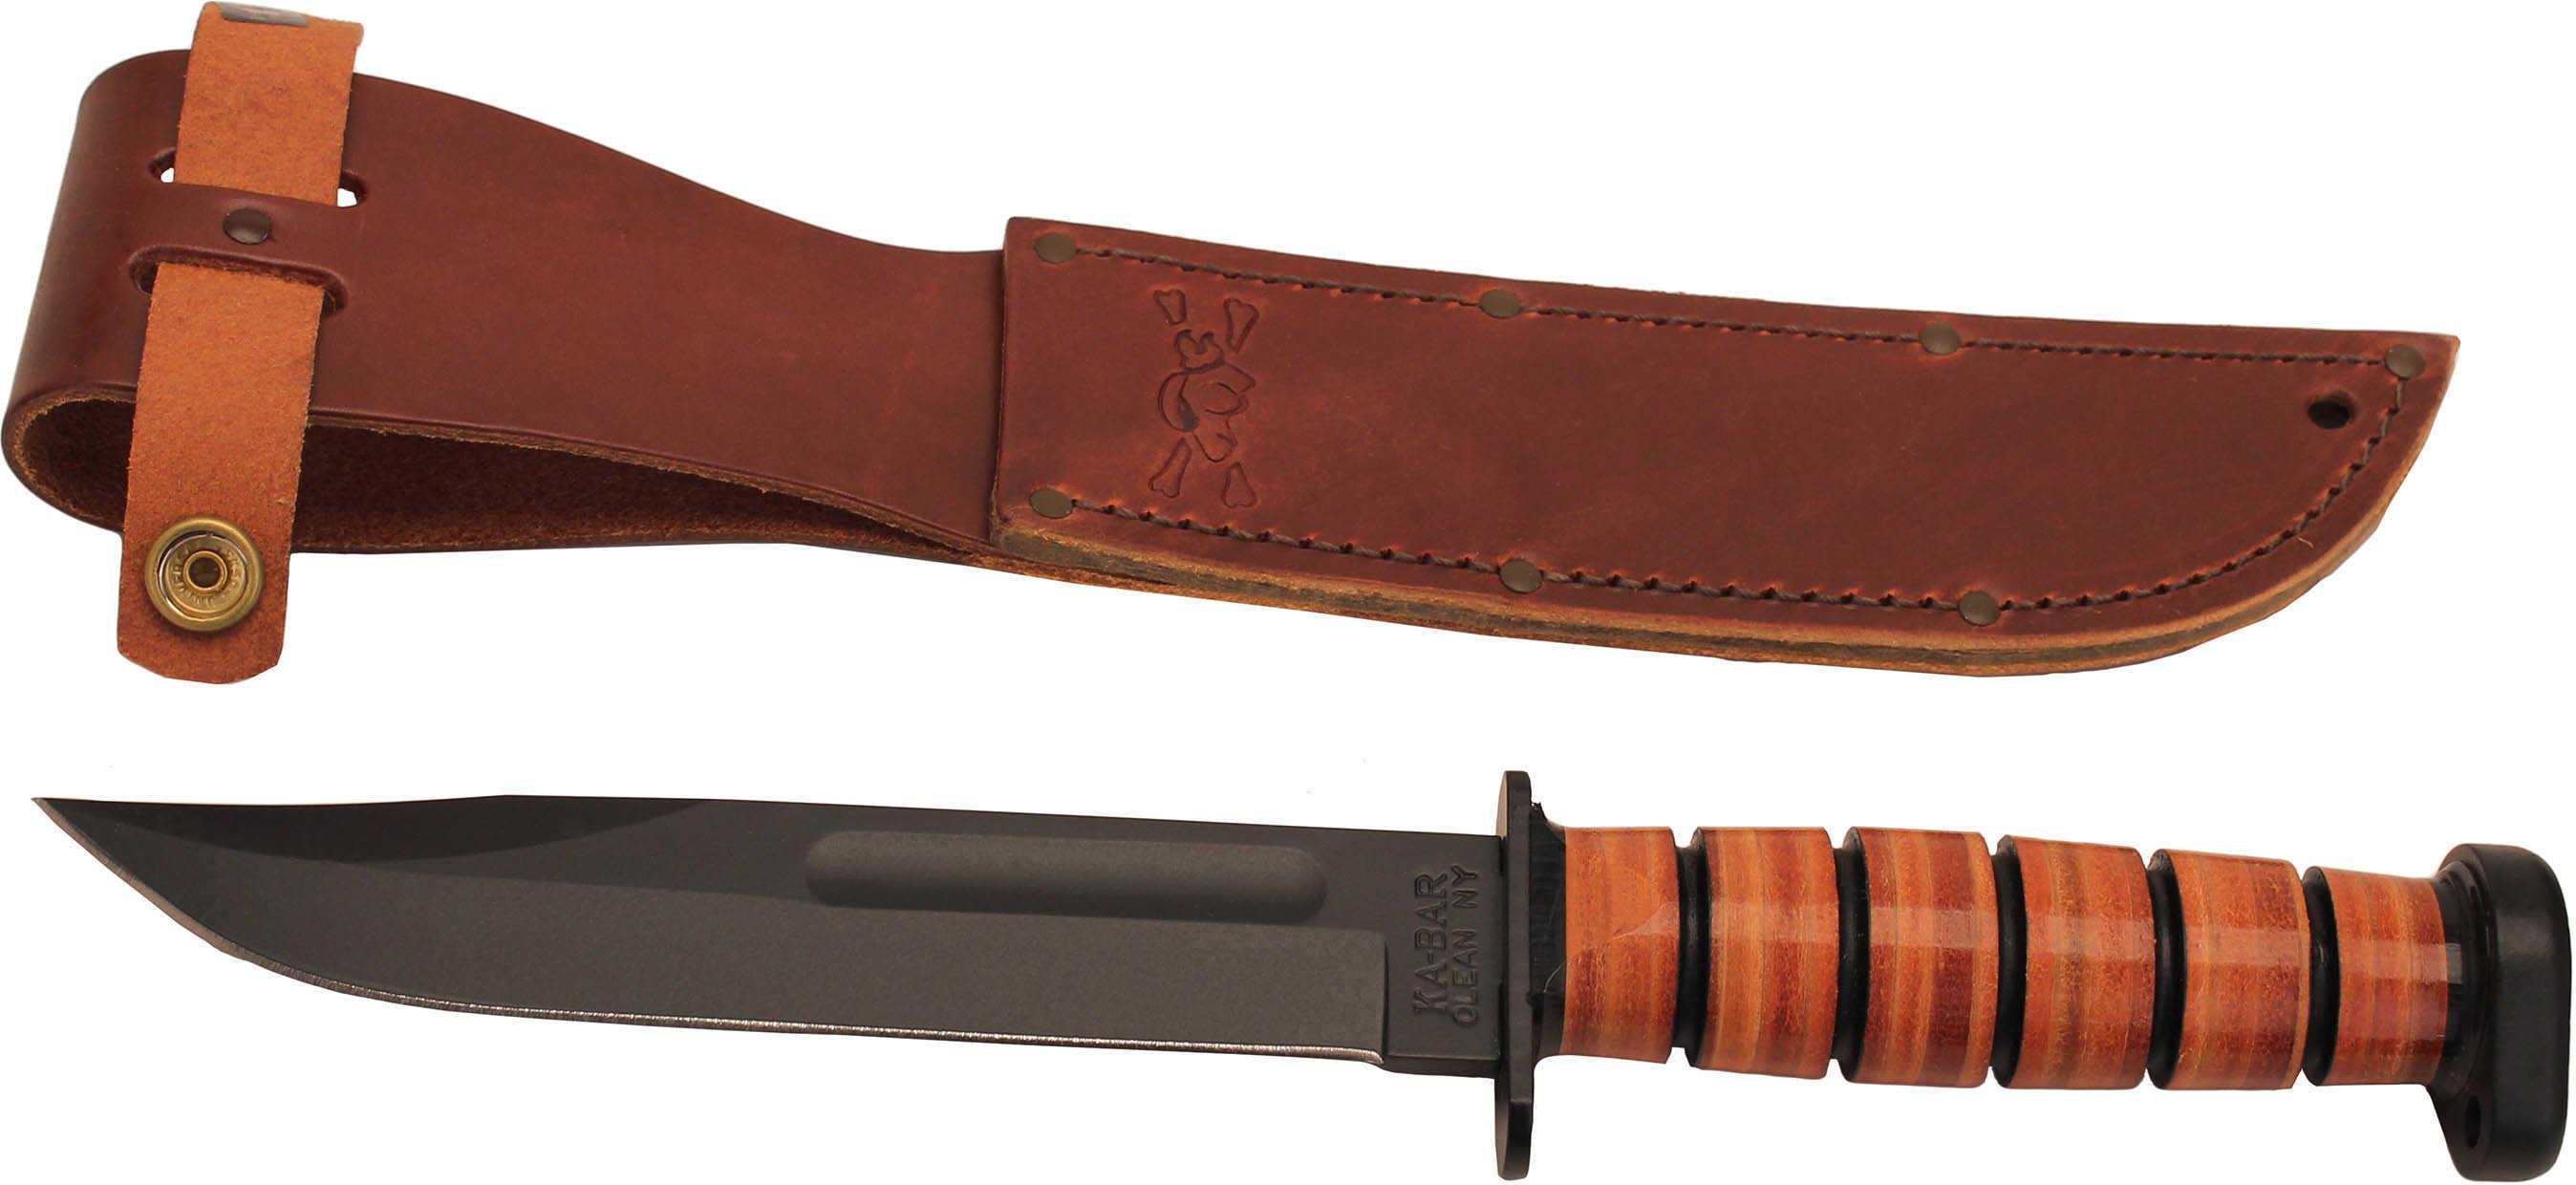 Ka-Bar Dog'S Head Utility Knife W/Sheath Md: 1317